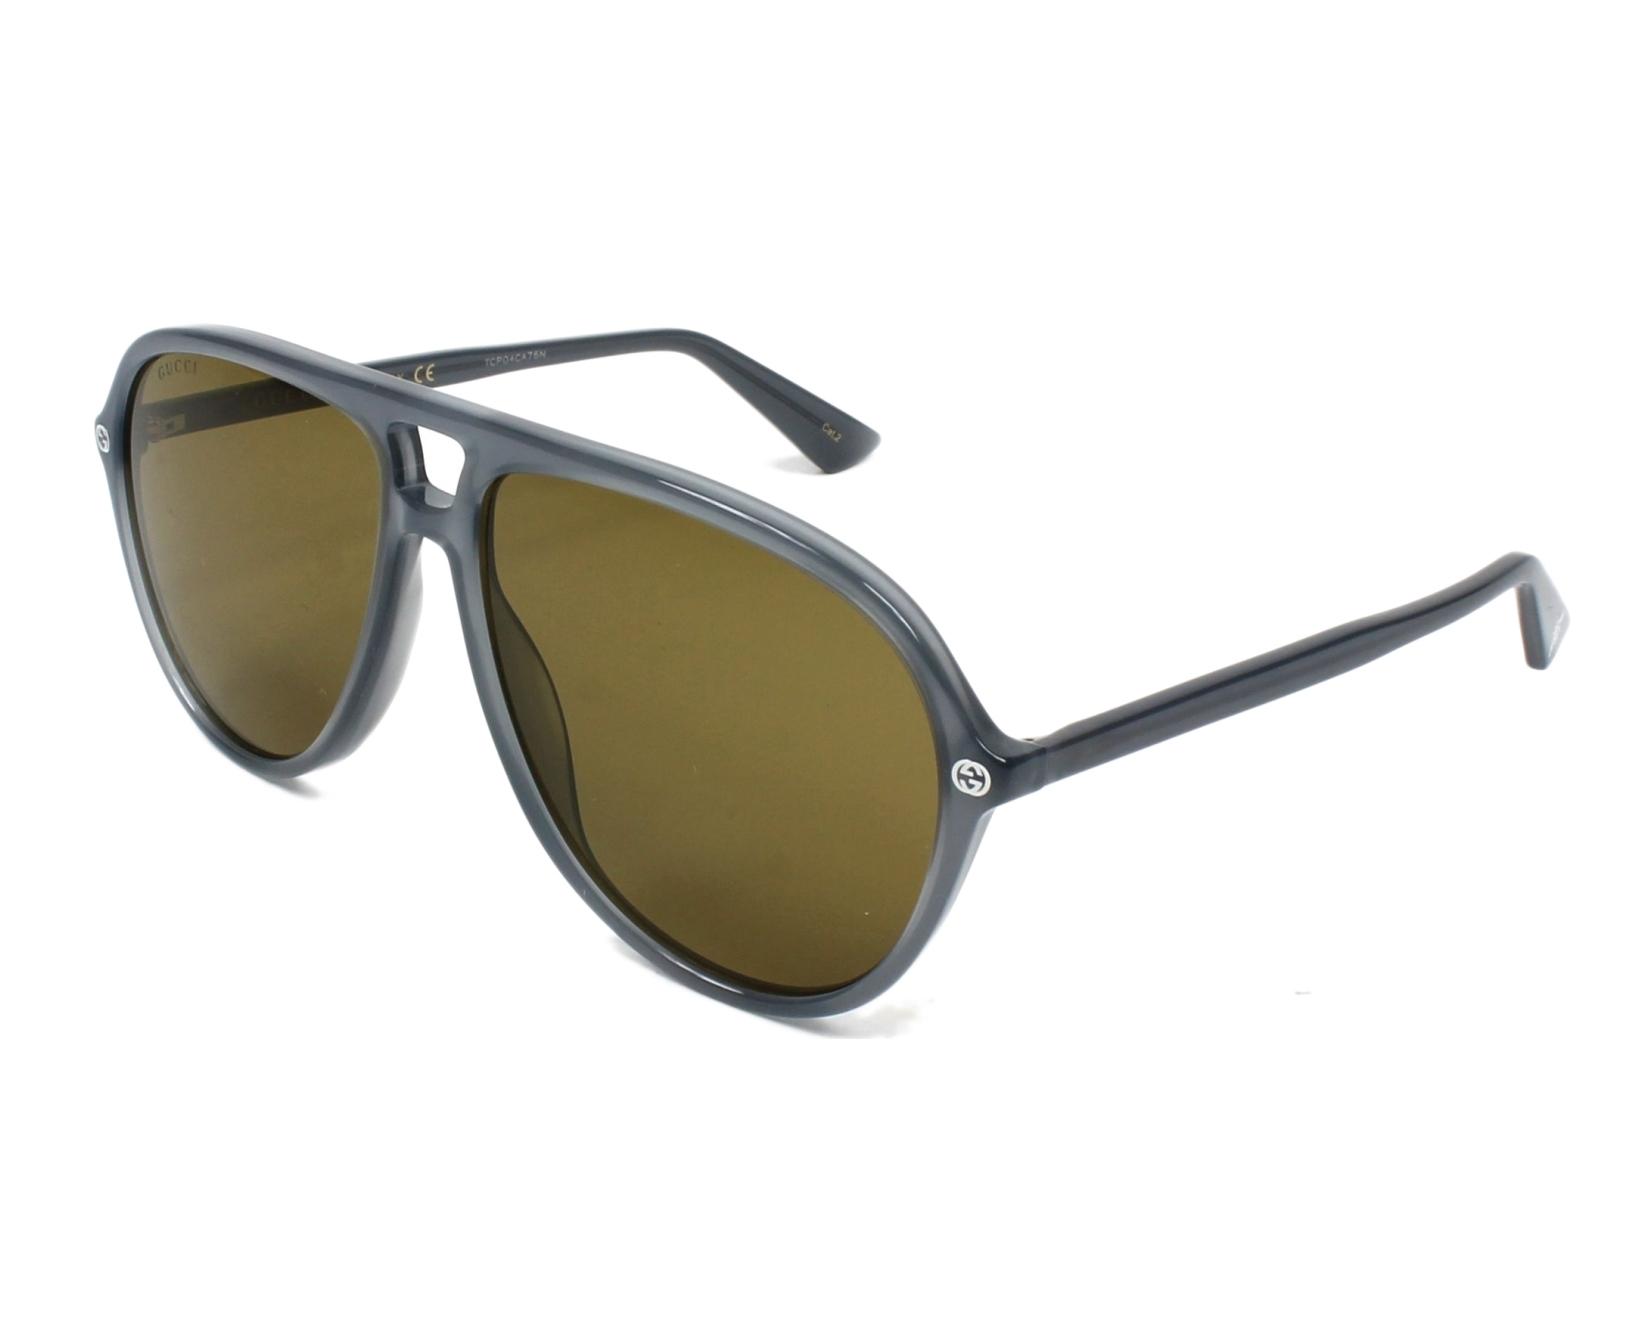 ef230c588bae9 Buy Gucci Sunglasses